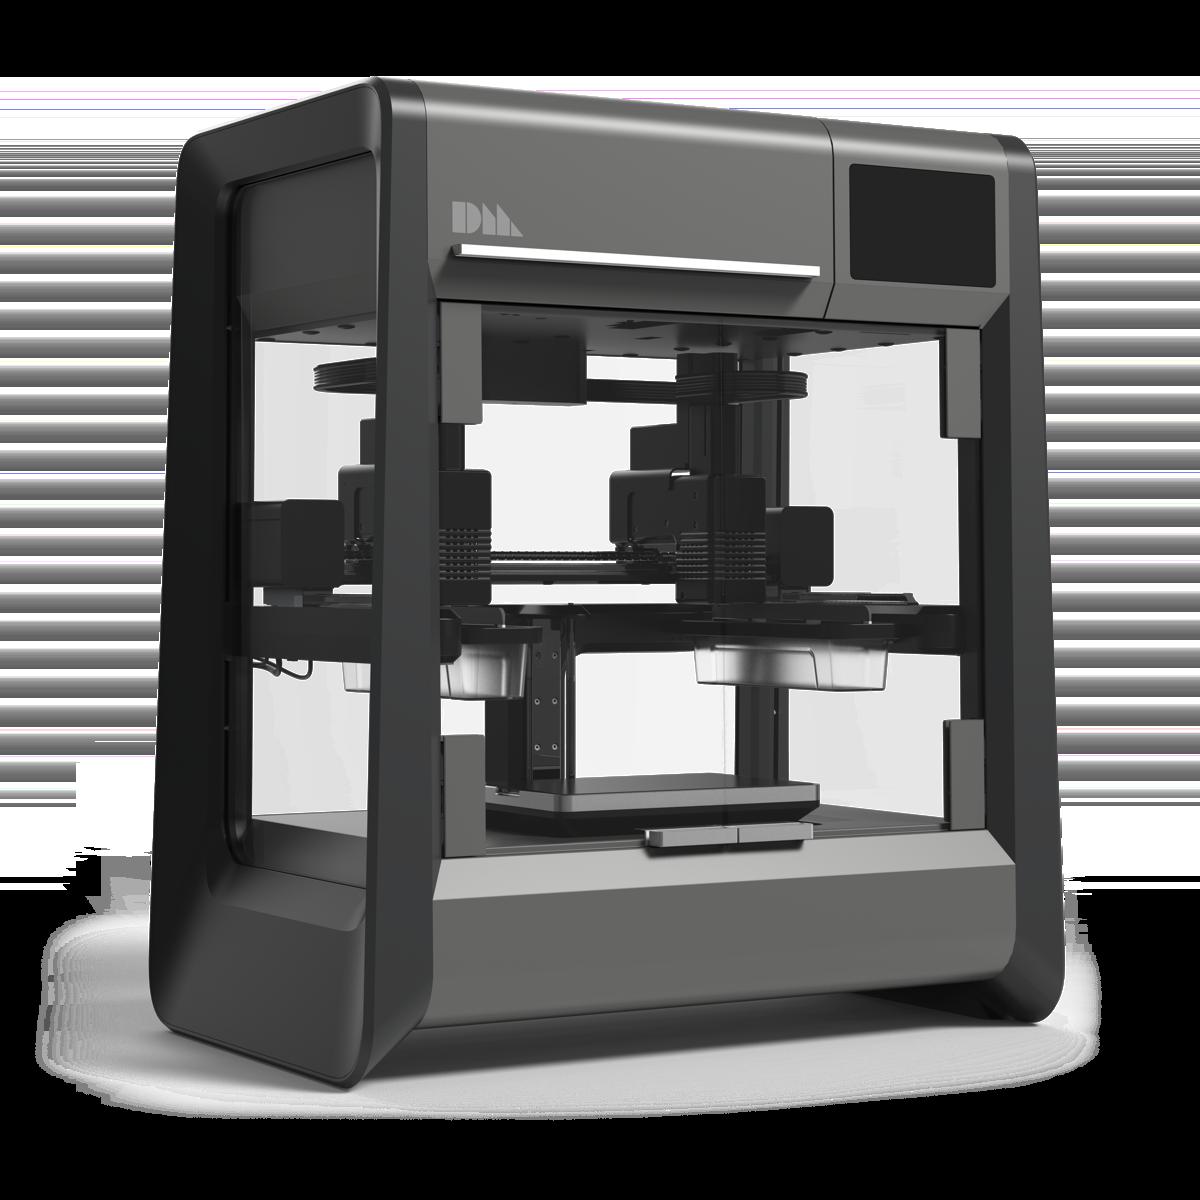 Studio Printer